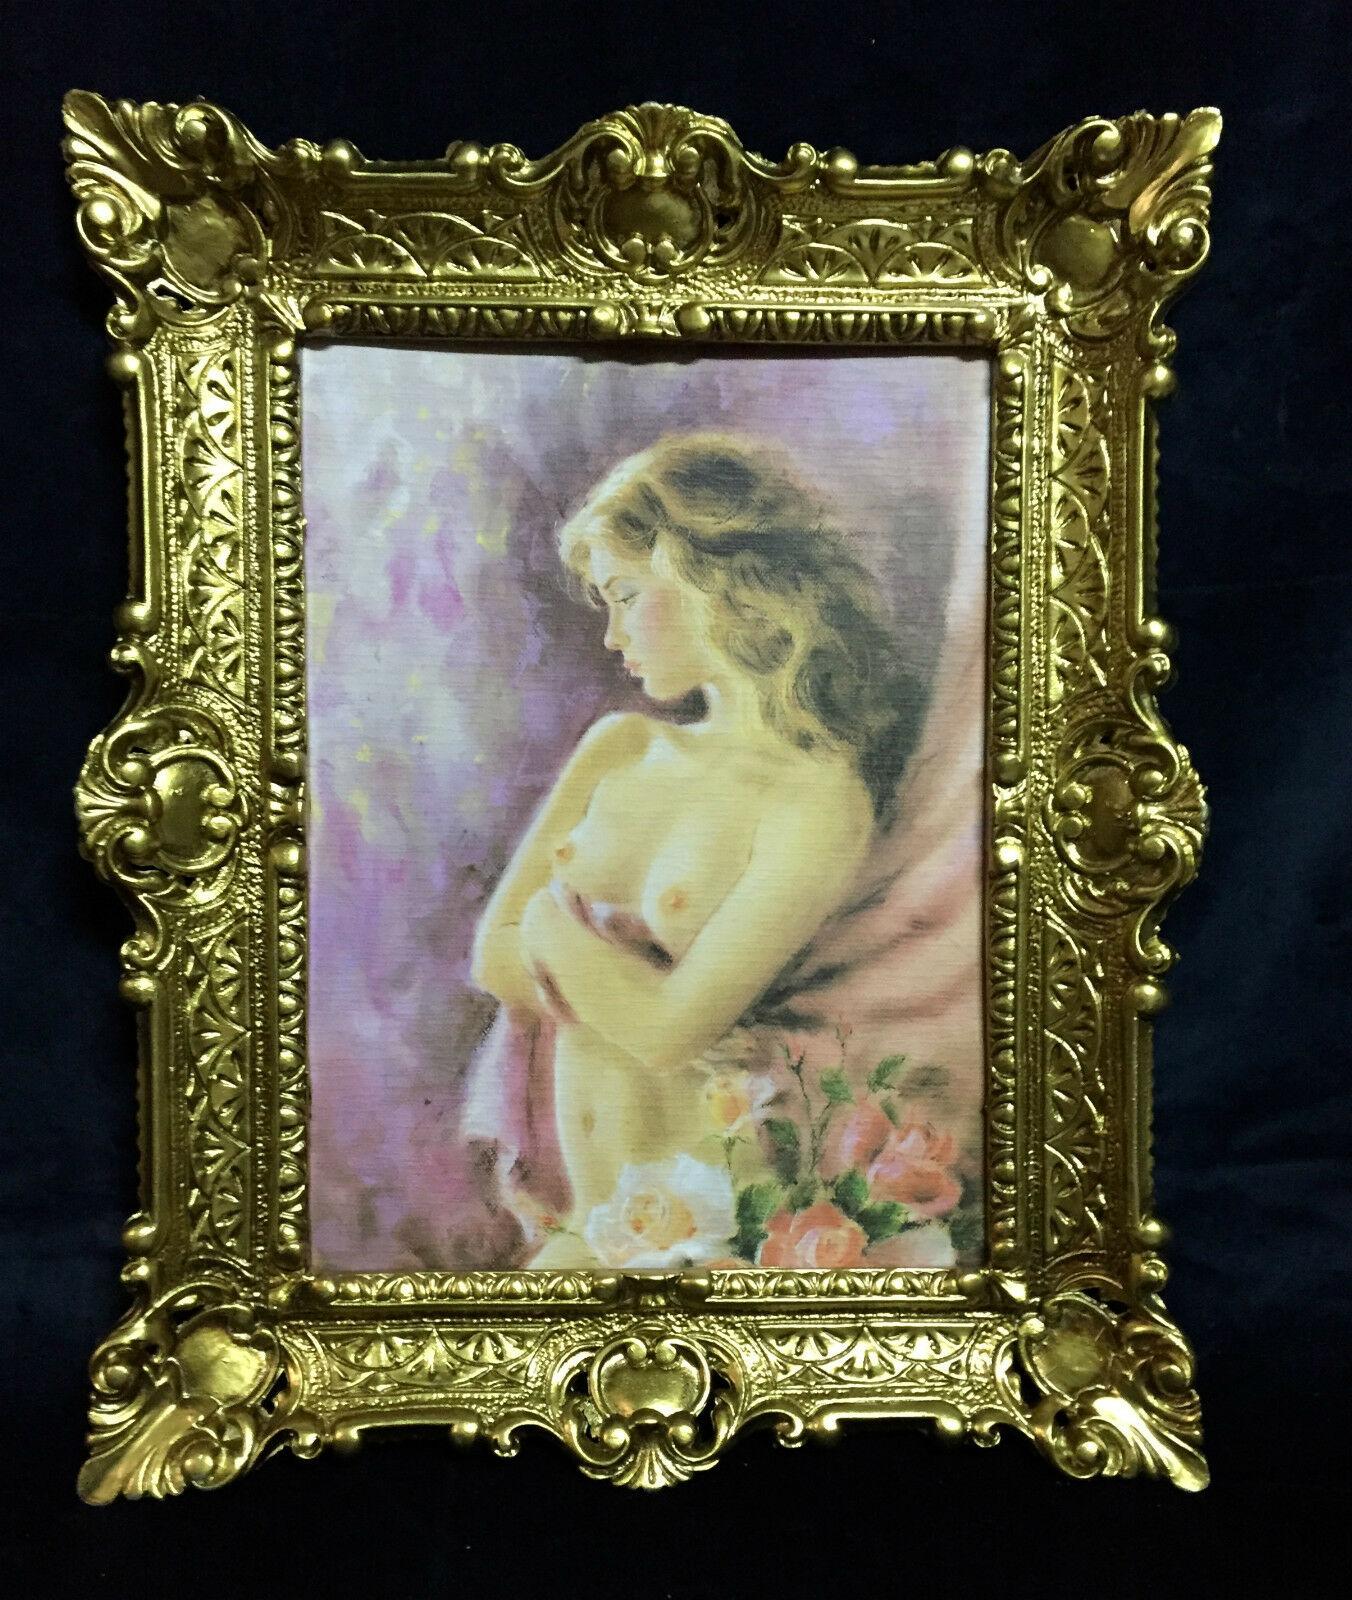 Akt Erotik Gemälde gerahmte Bild 56x46 Frau Nackt Bild mit Rahmen ...